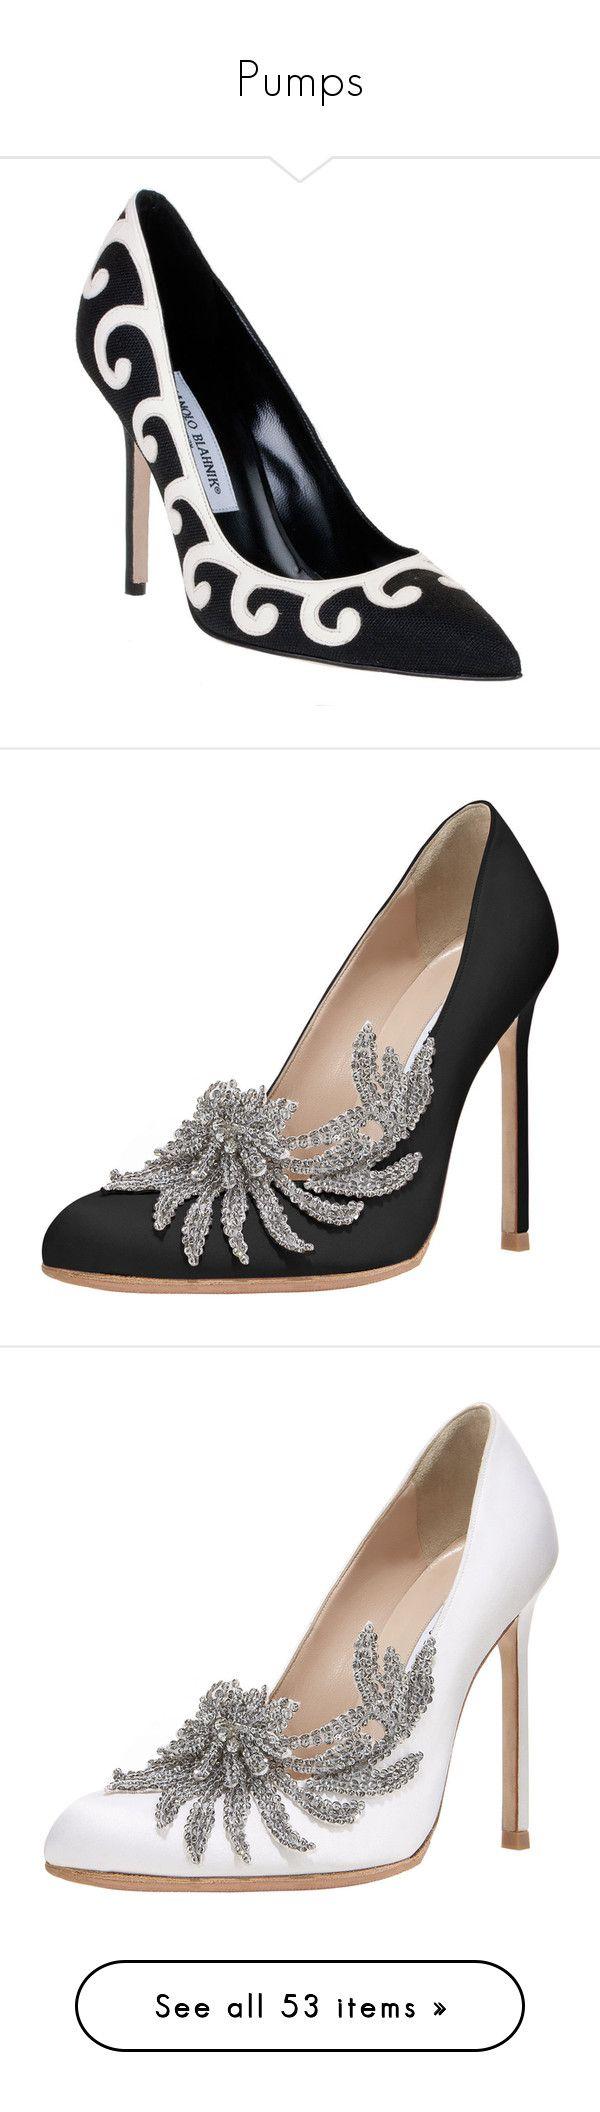 """Pumps"" by kleinervampier ❤ liked on Polyvore featuring shoes, pumps, heels, black, high heels, black and white shoes, high heel pumps, black white pumps, high heeled footwear and high heel court shoes"